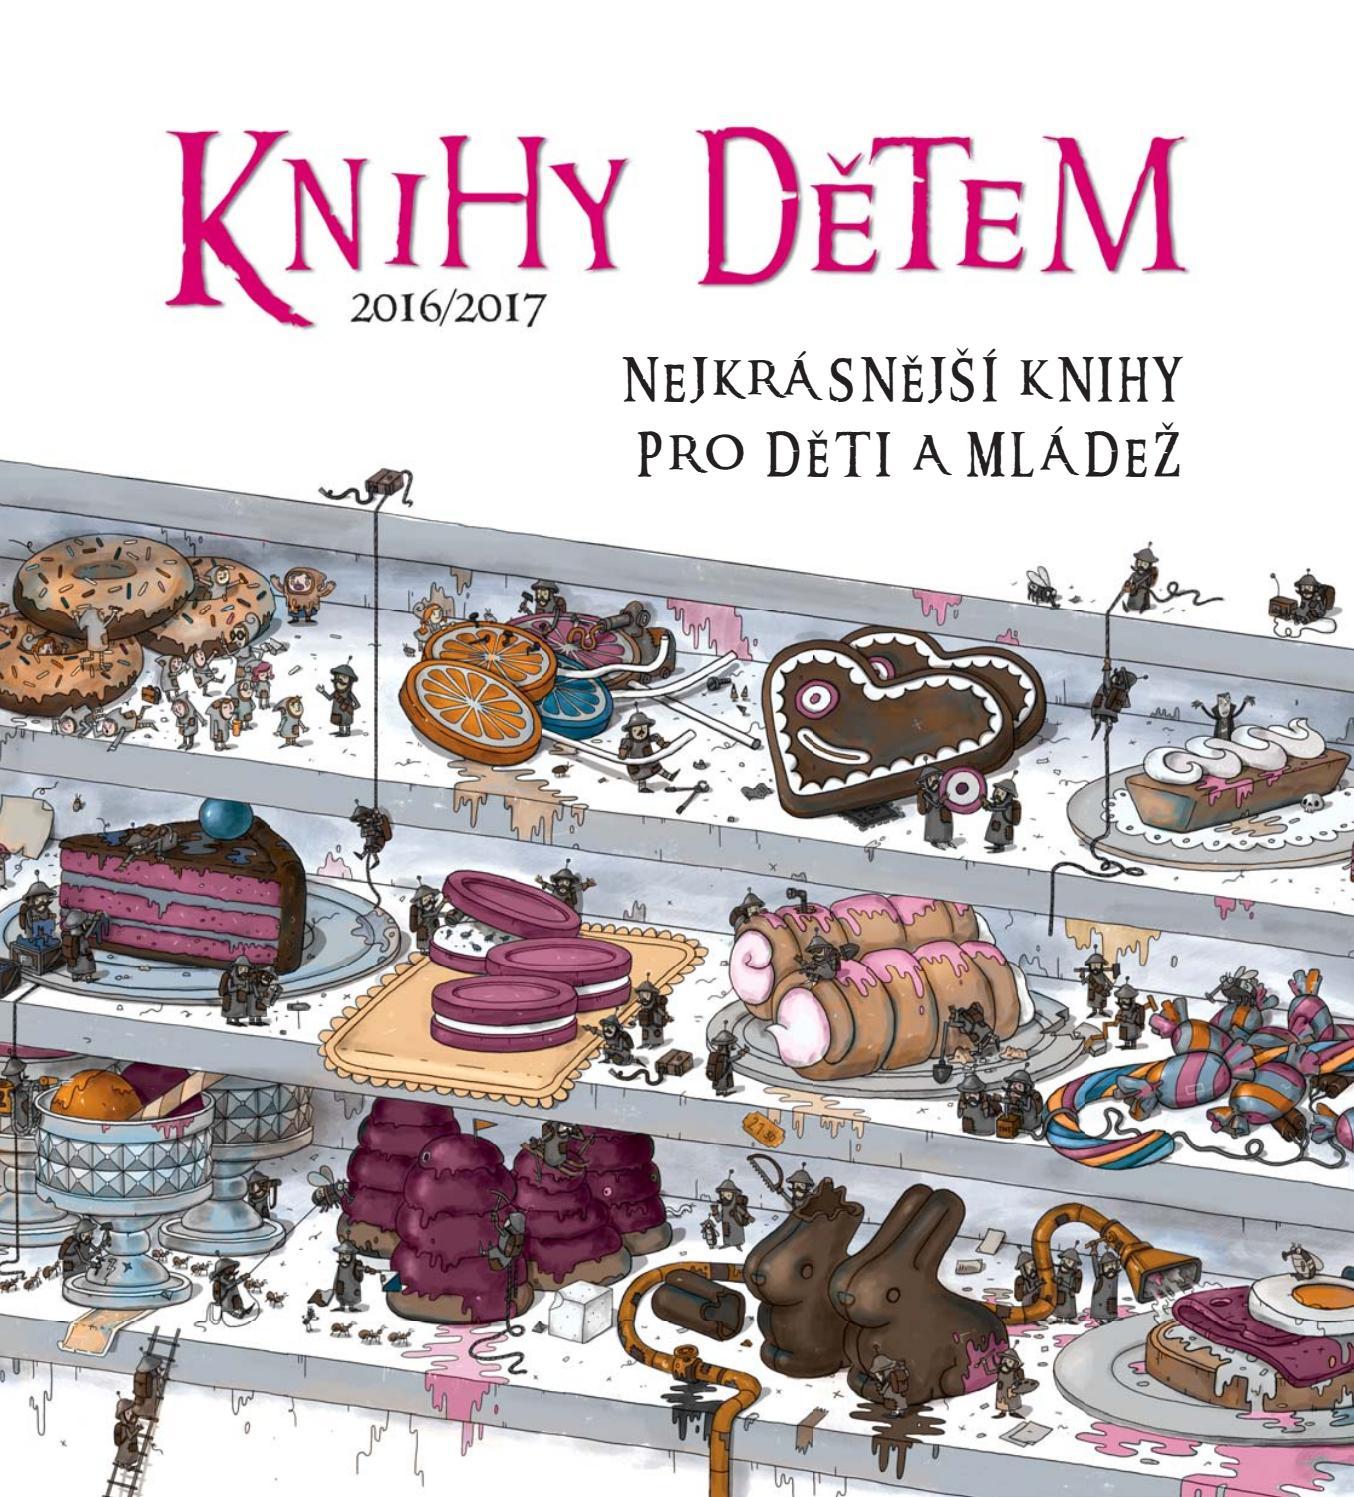 Knihy dětem 2016 2017 by Albatros Media a.s. - issuu d3dbd9679d